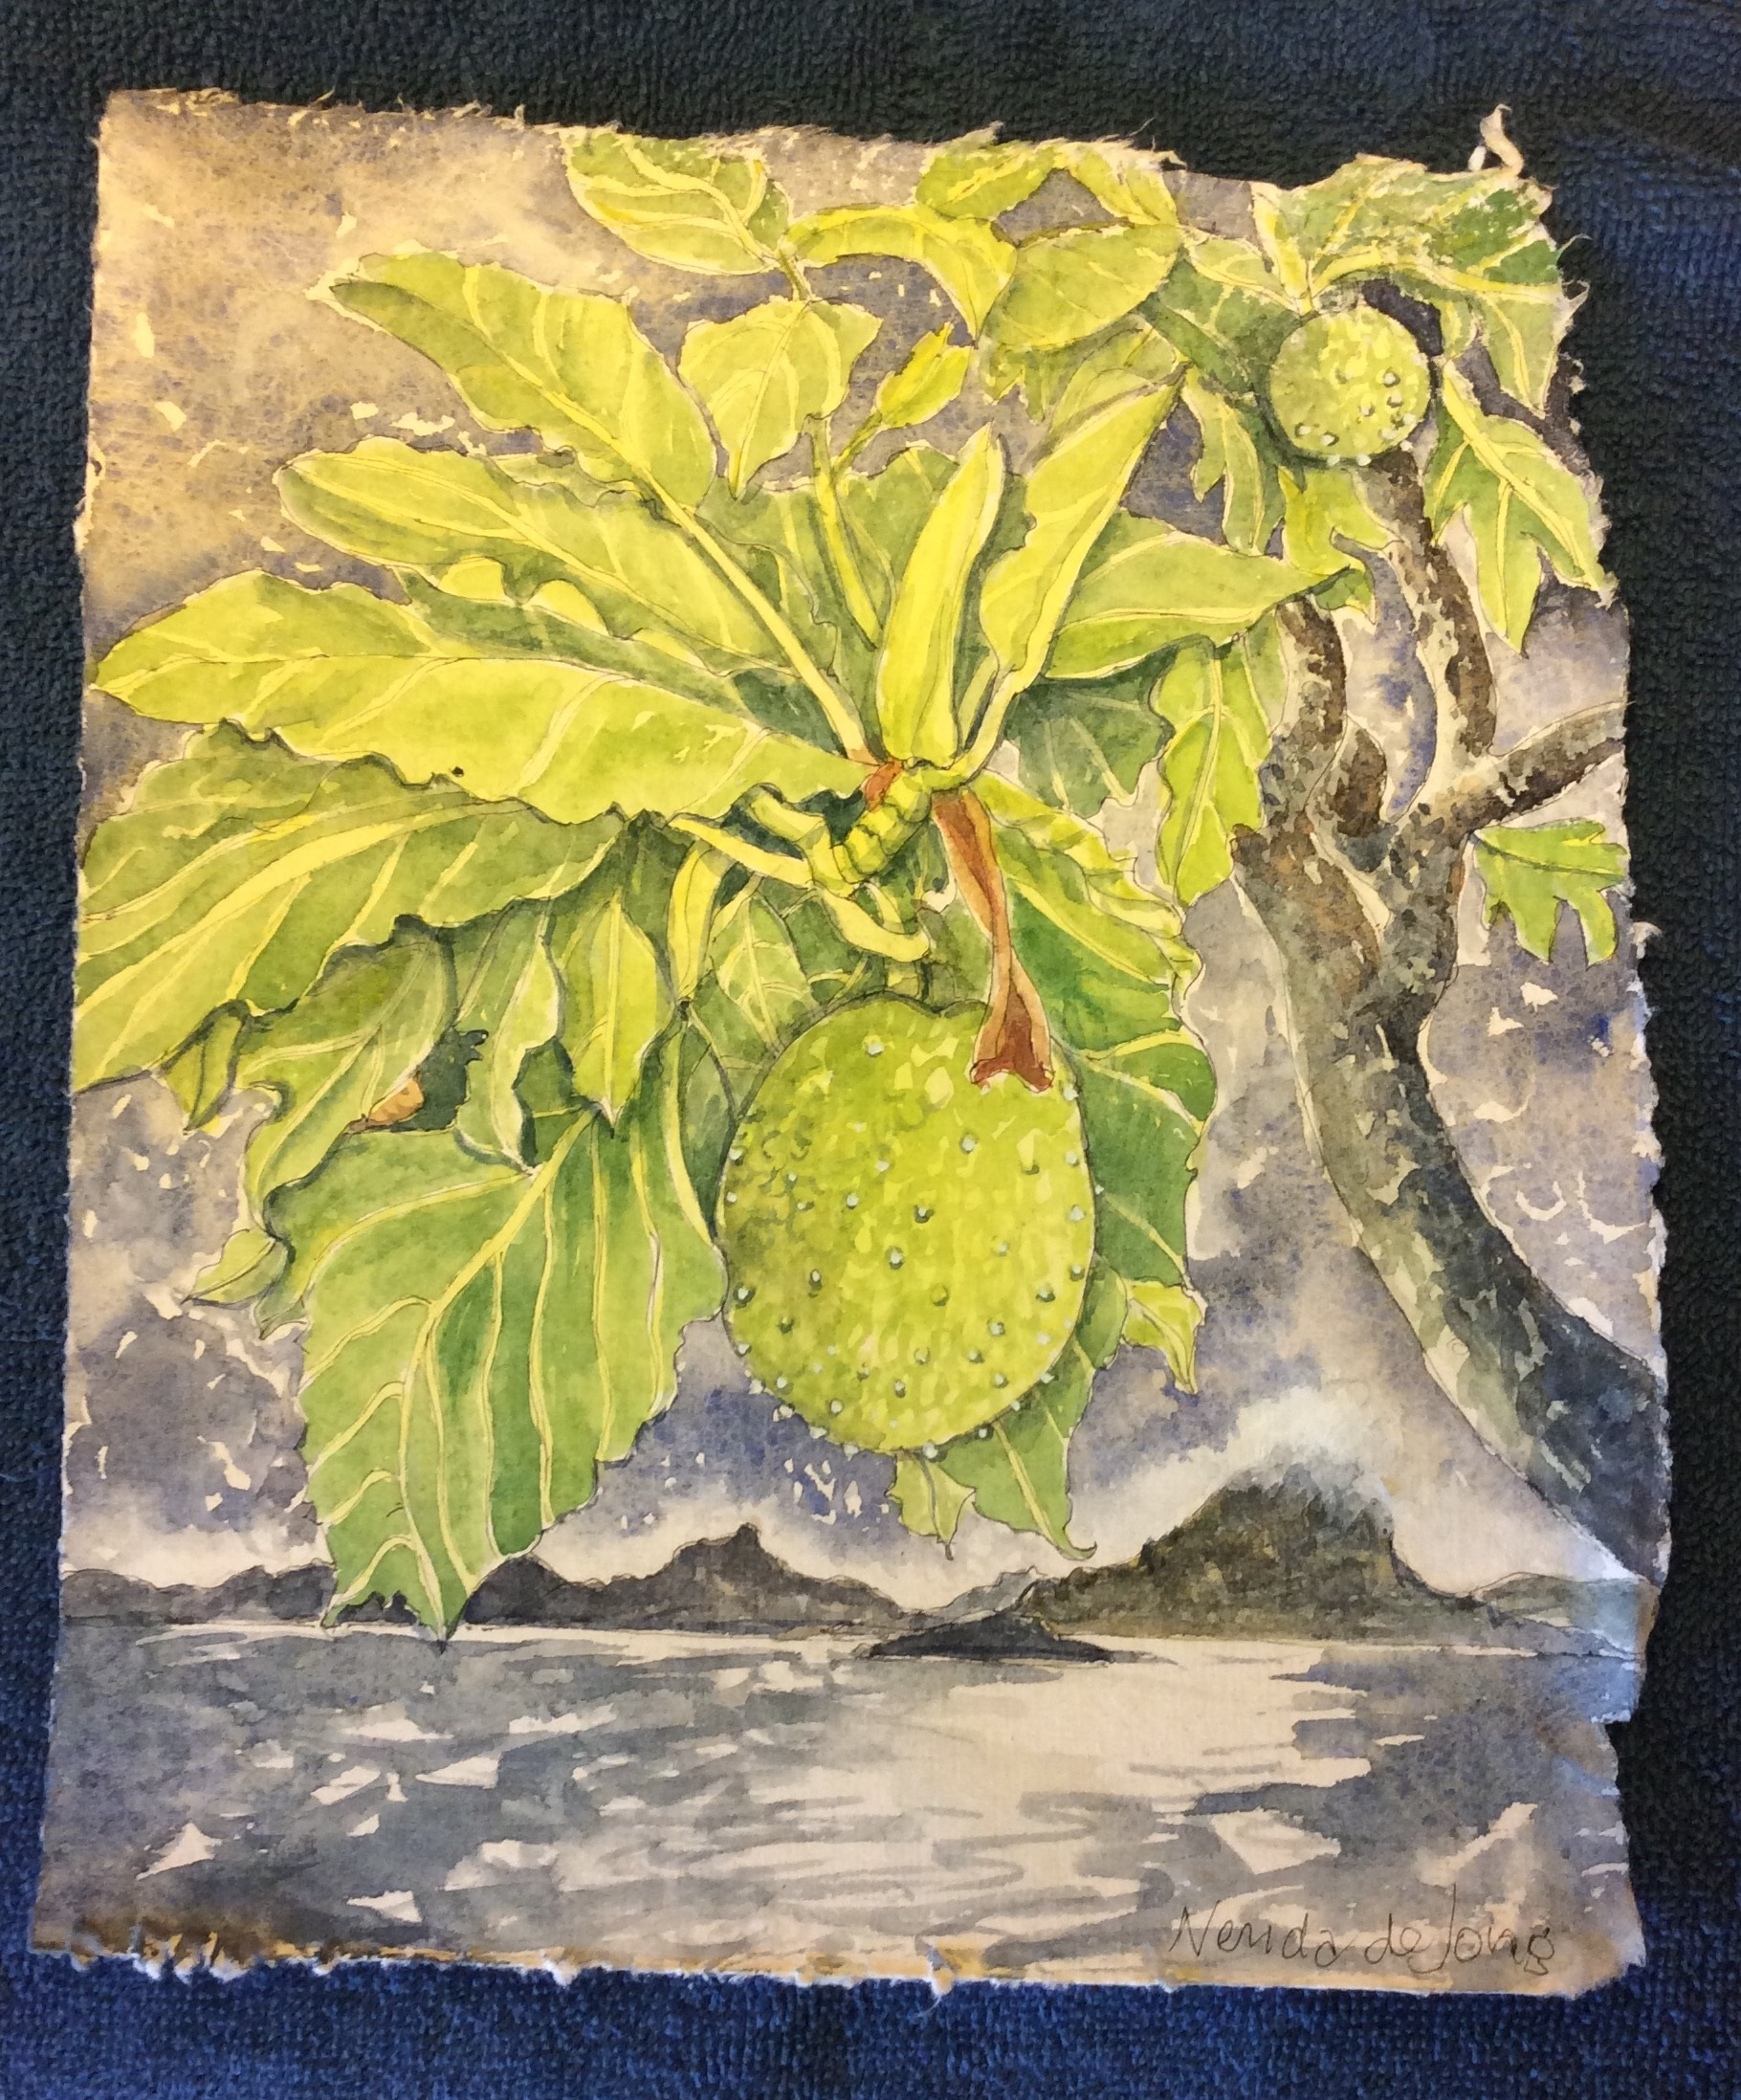 Breadfruit and Bora Bora